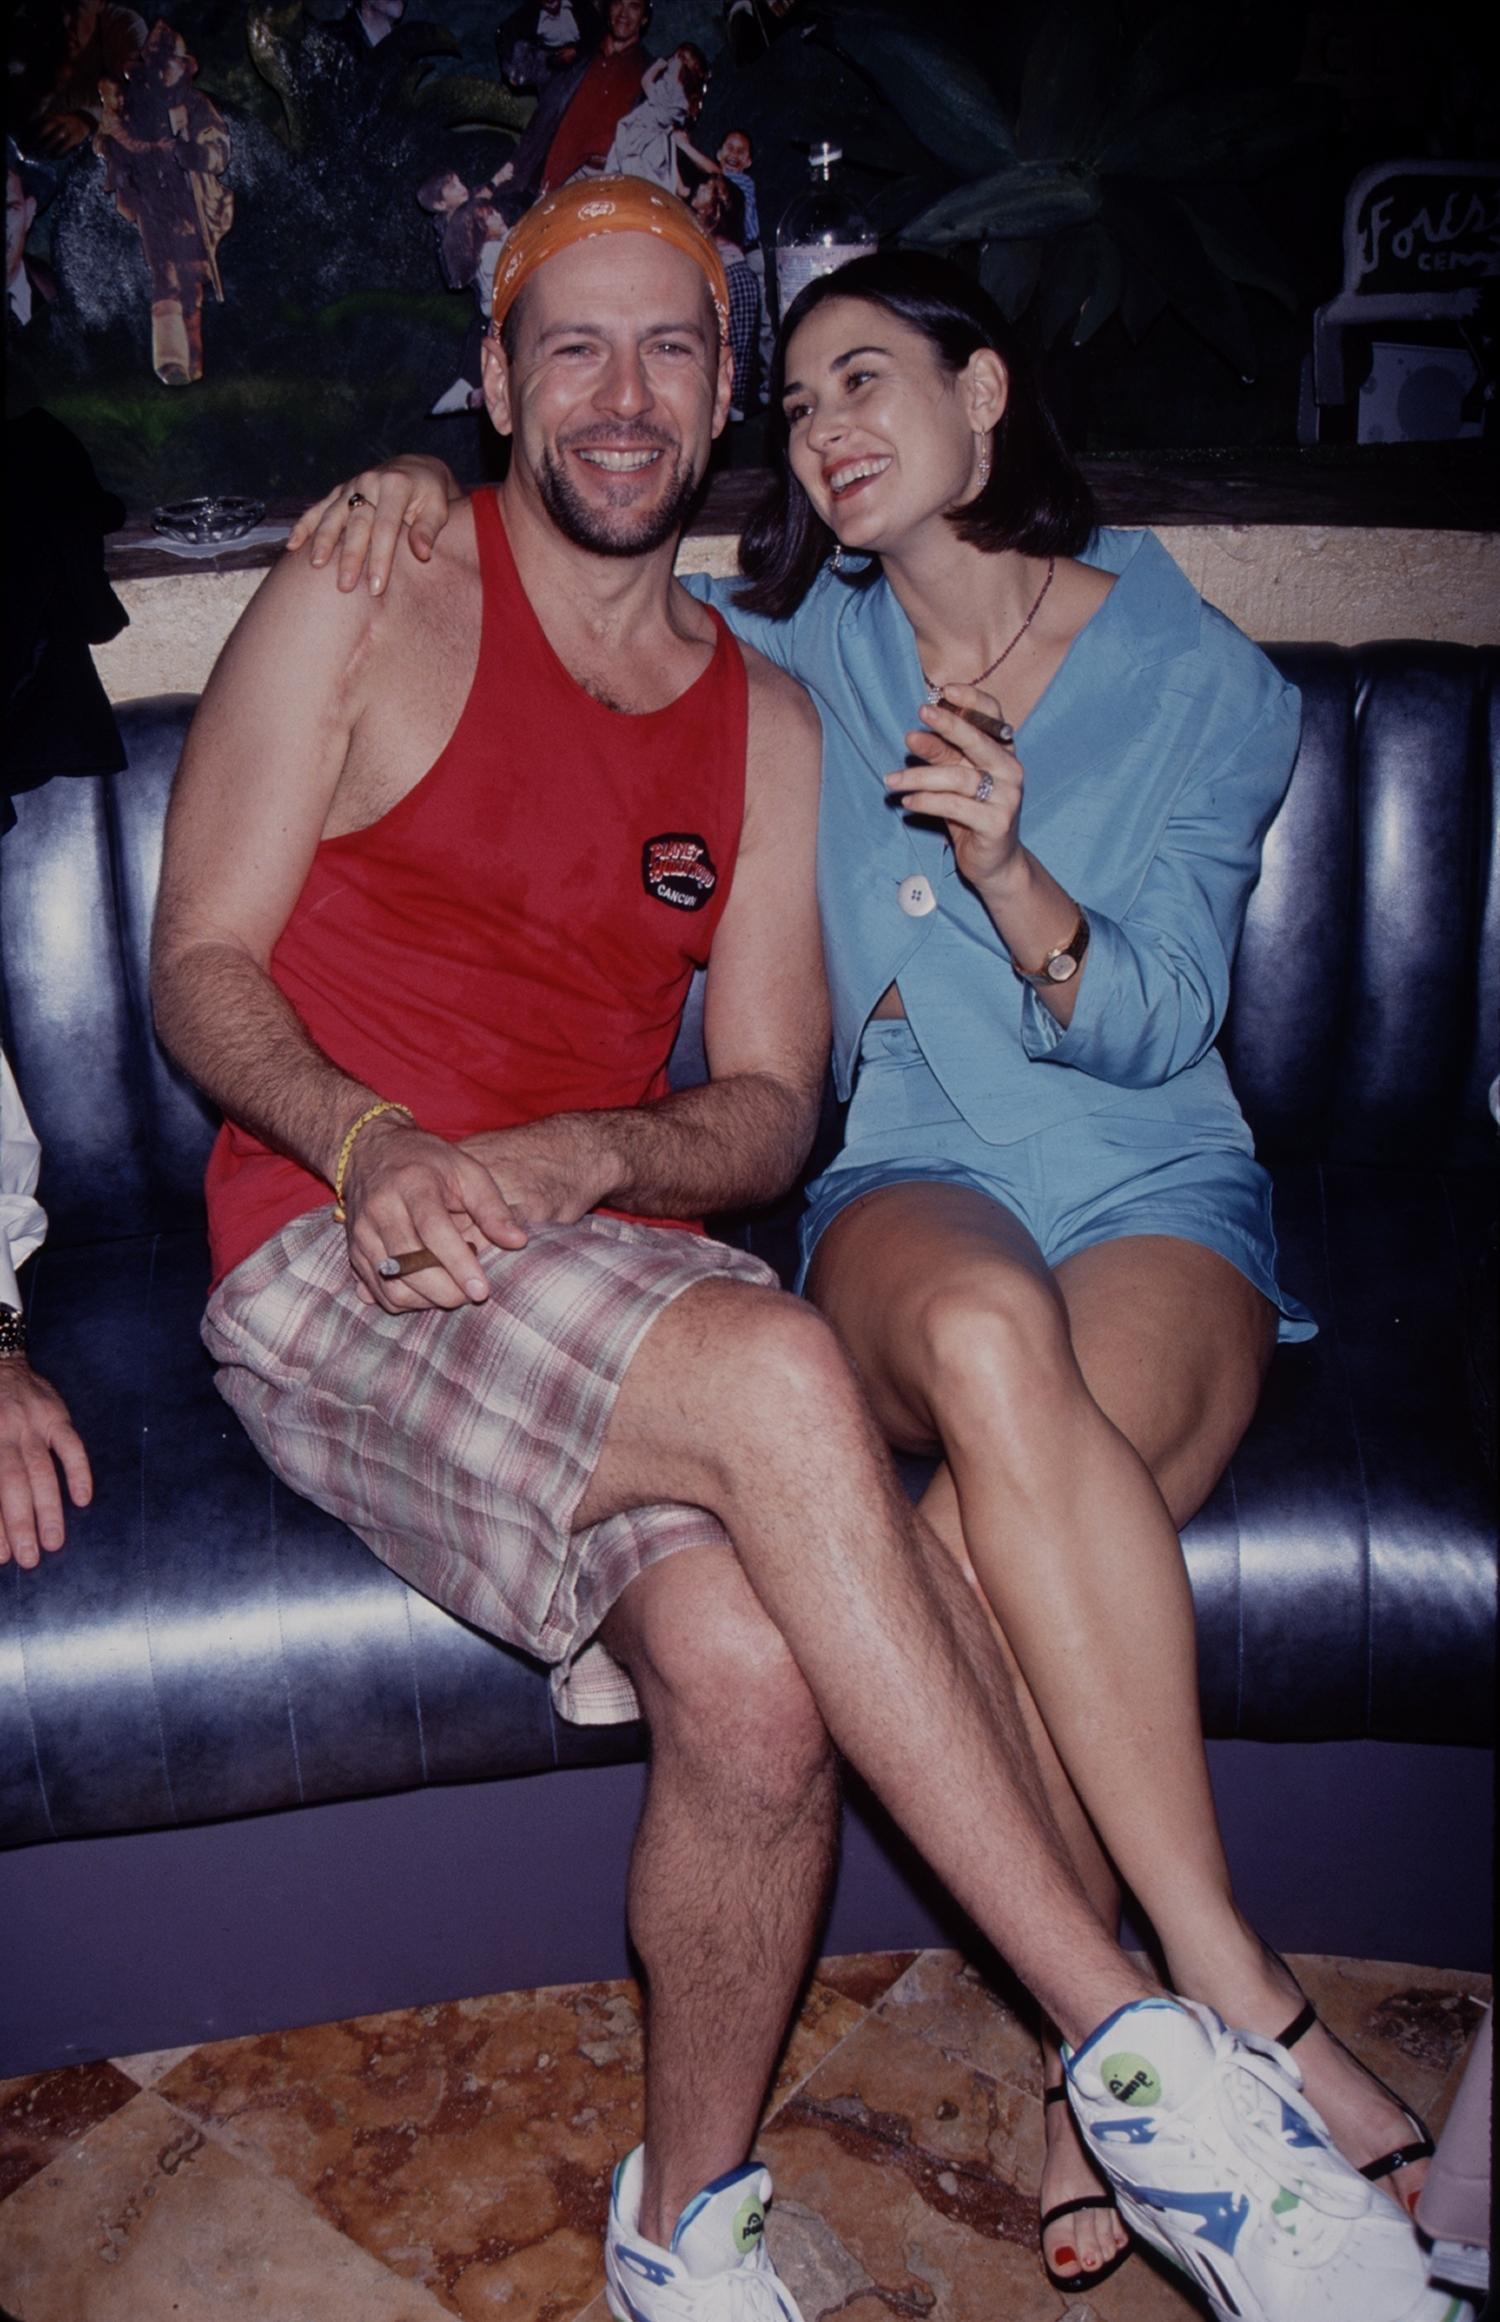 UNITED STATES - Demi Moore and Bruce Willis, circa 1995.